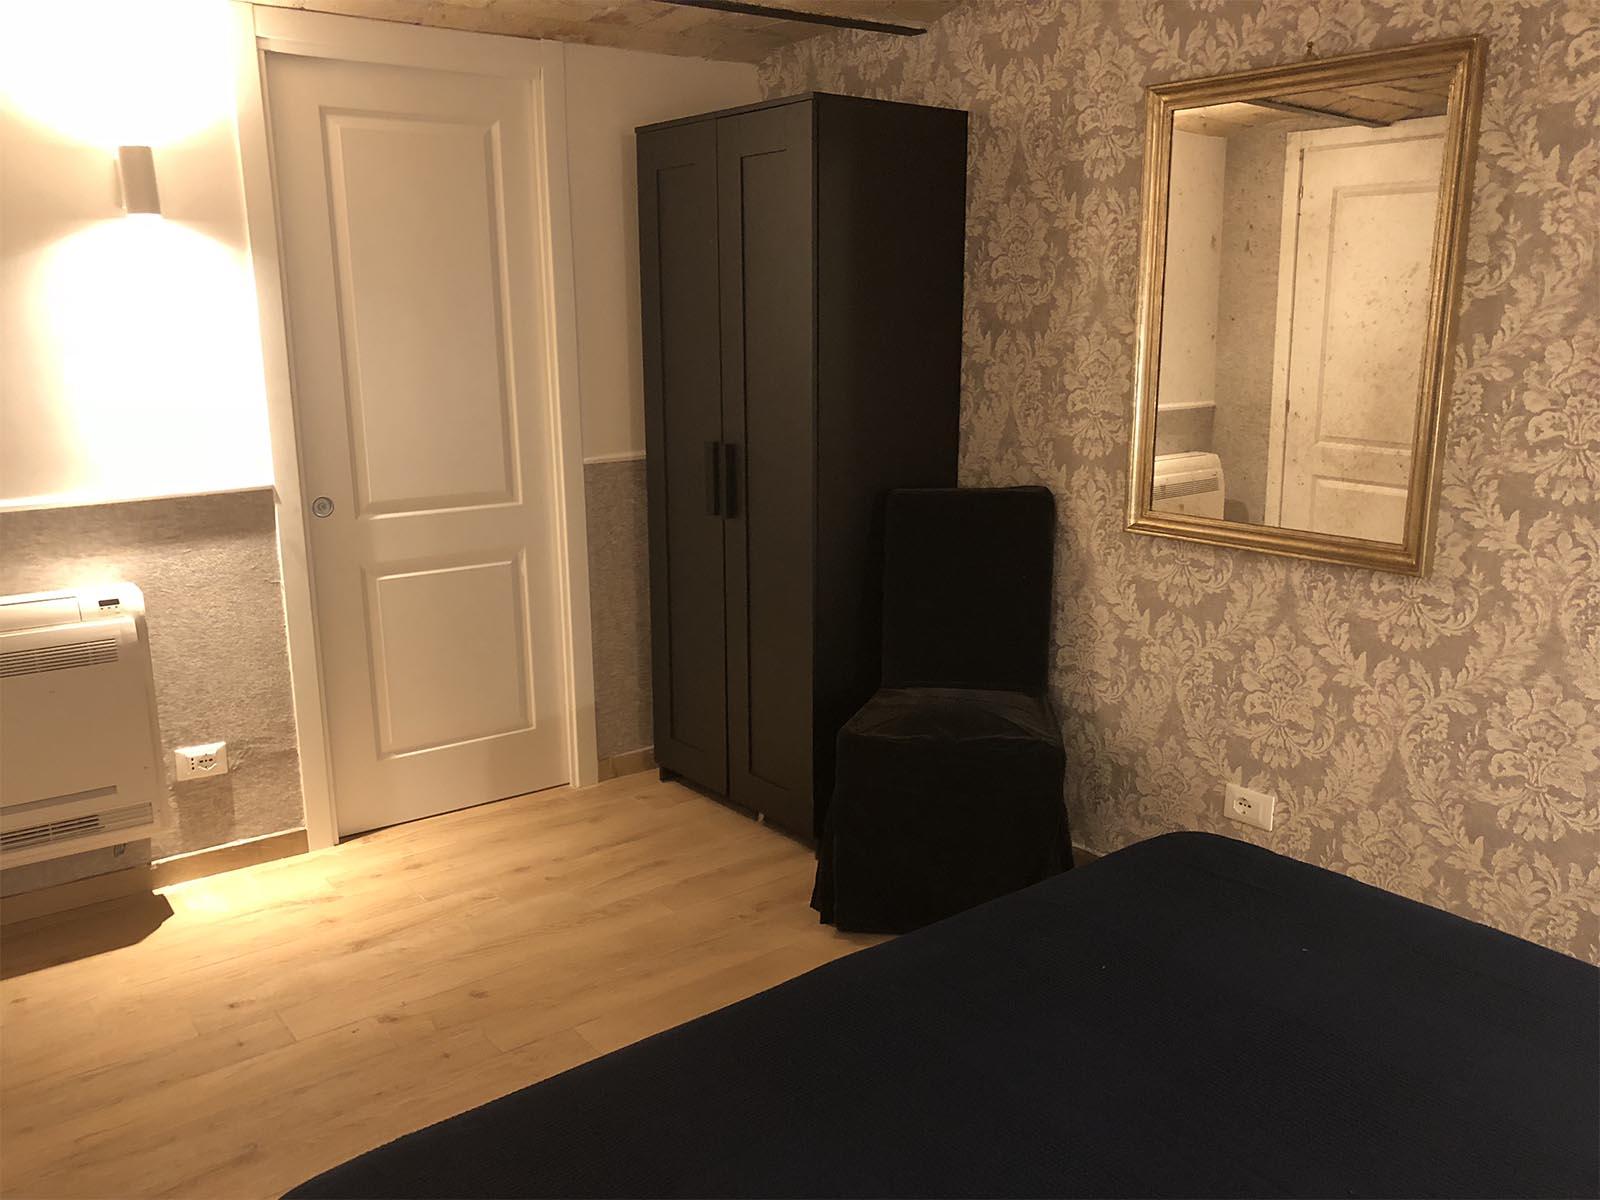 Giolitti Suite Interior